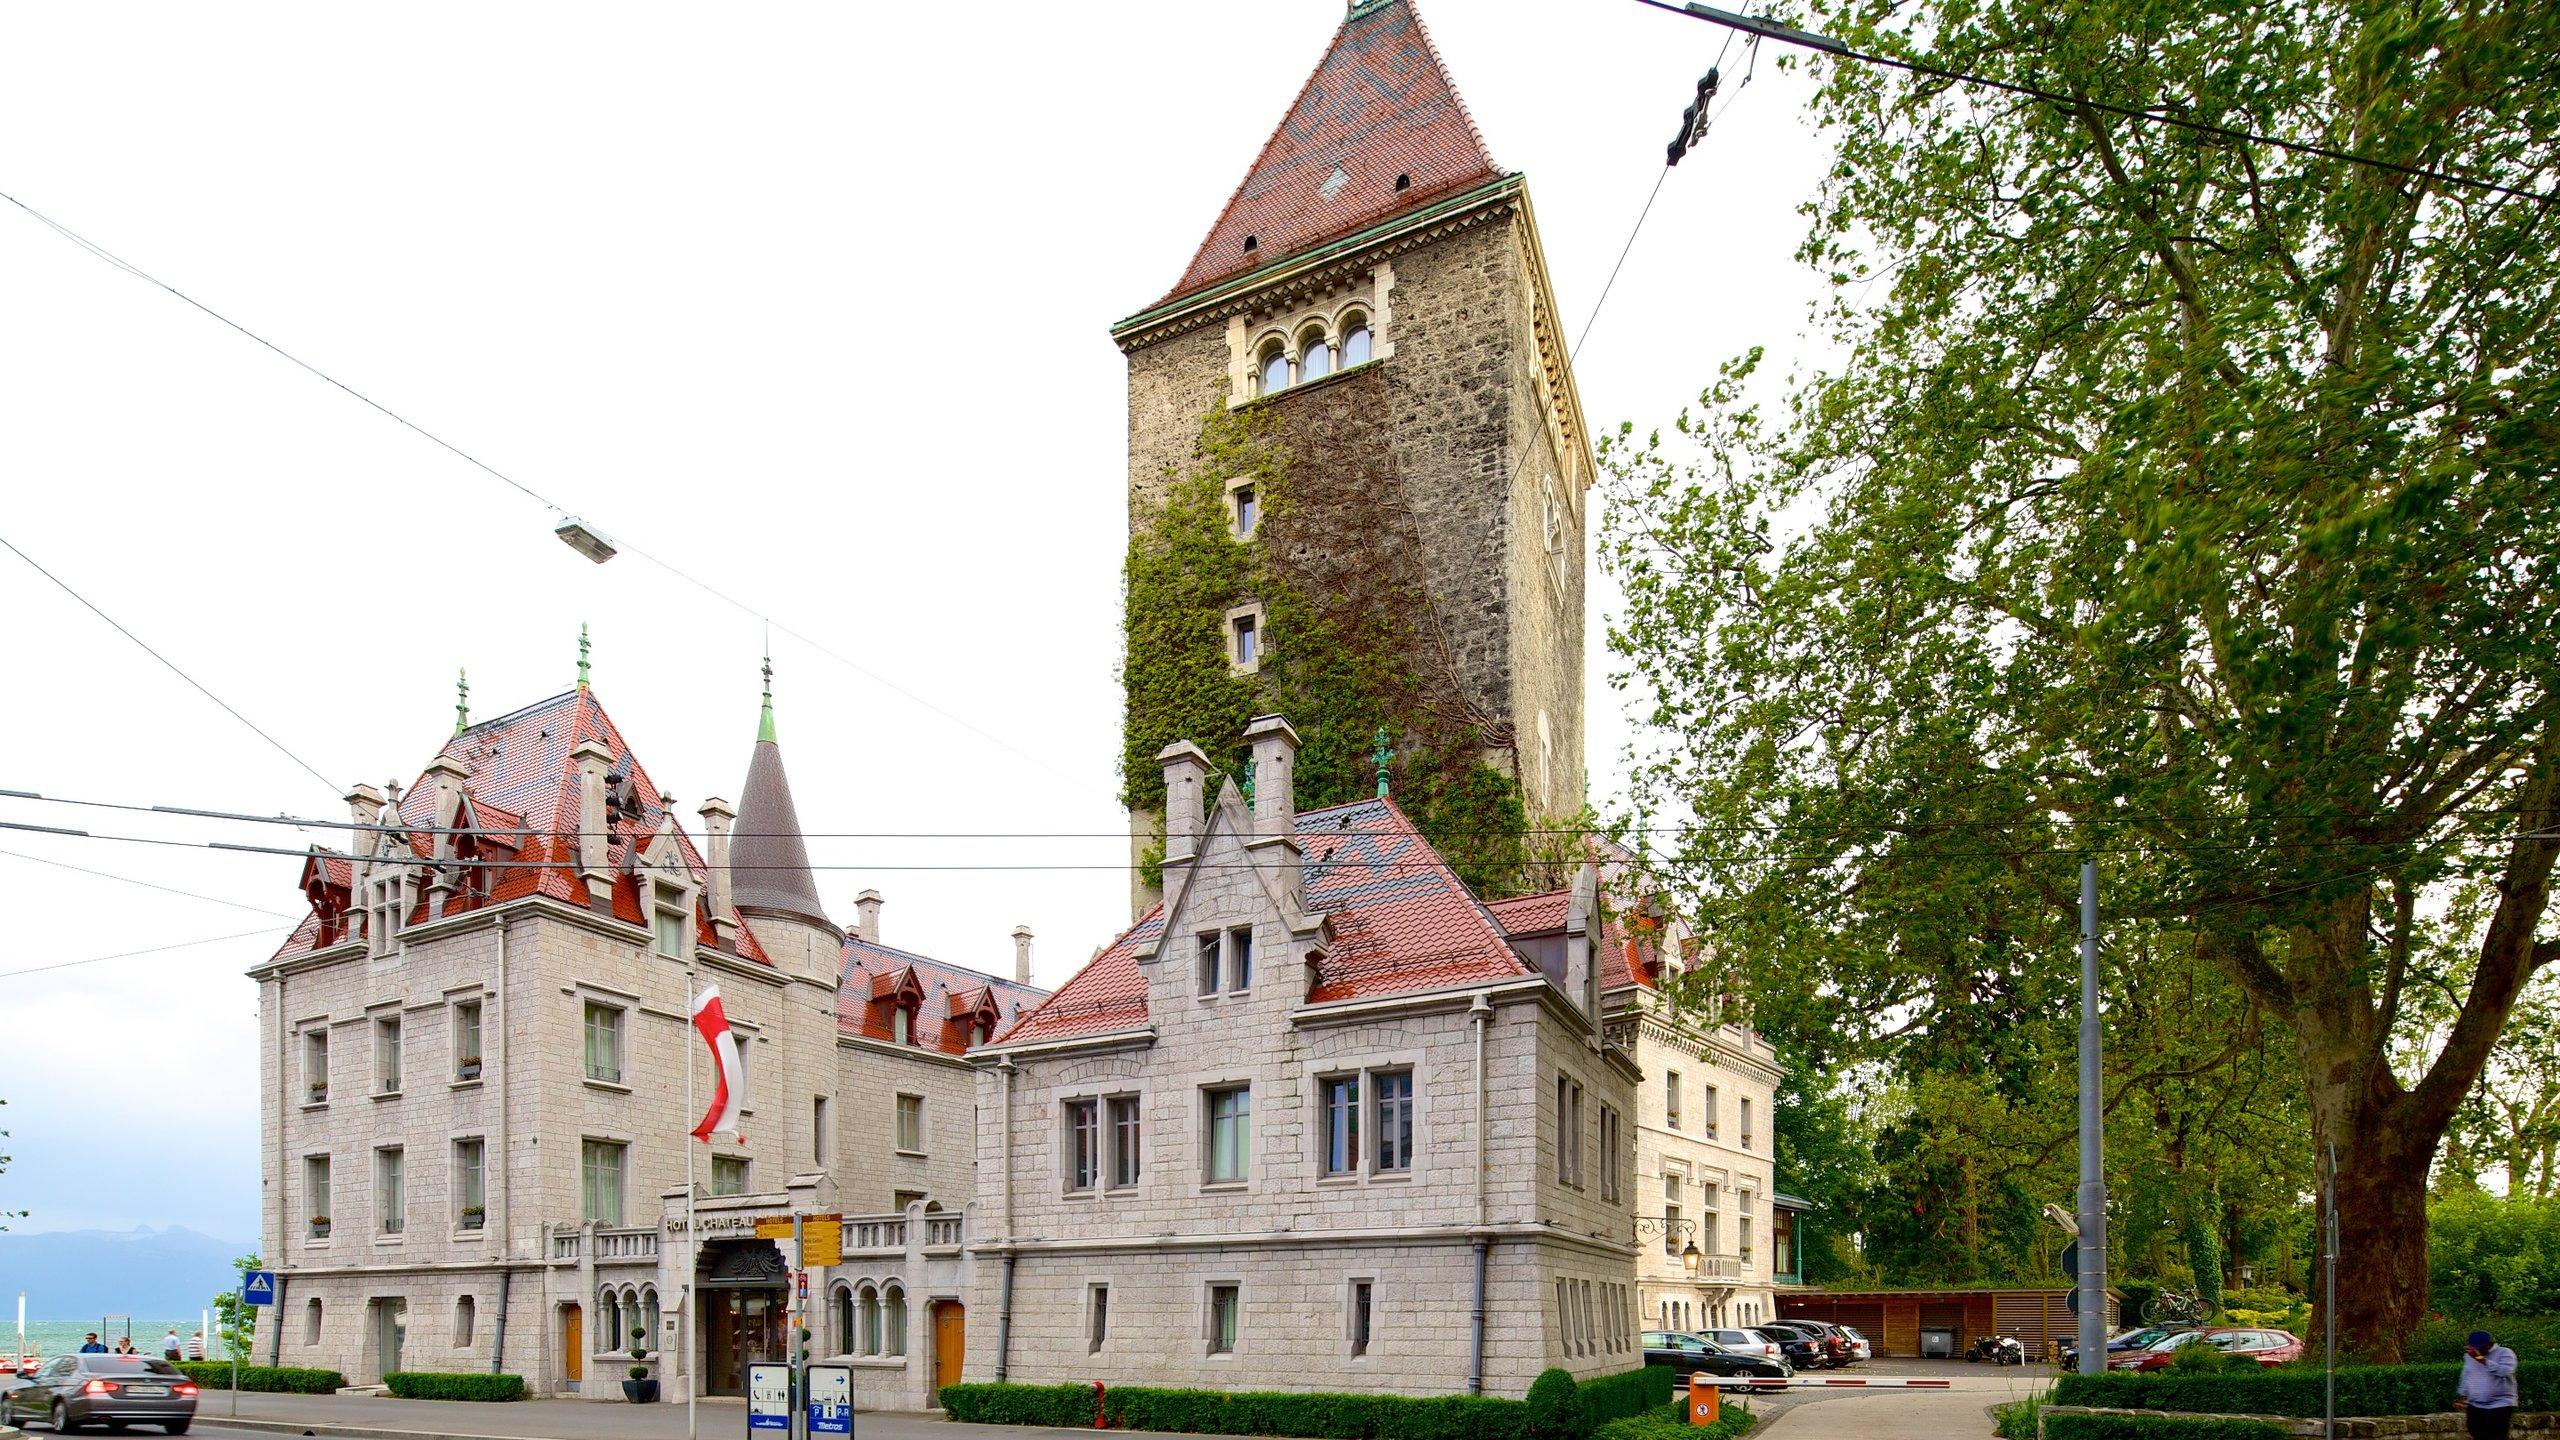 Lausanne, Canton of Vaud, Switzerland